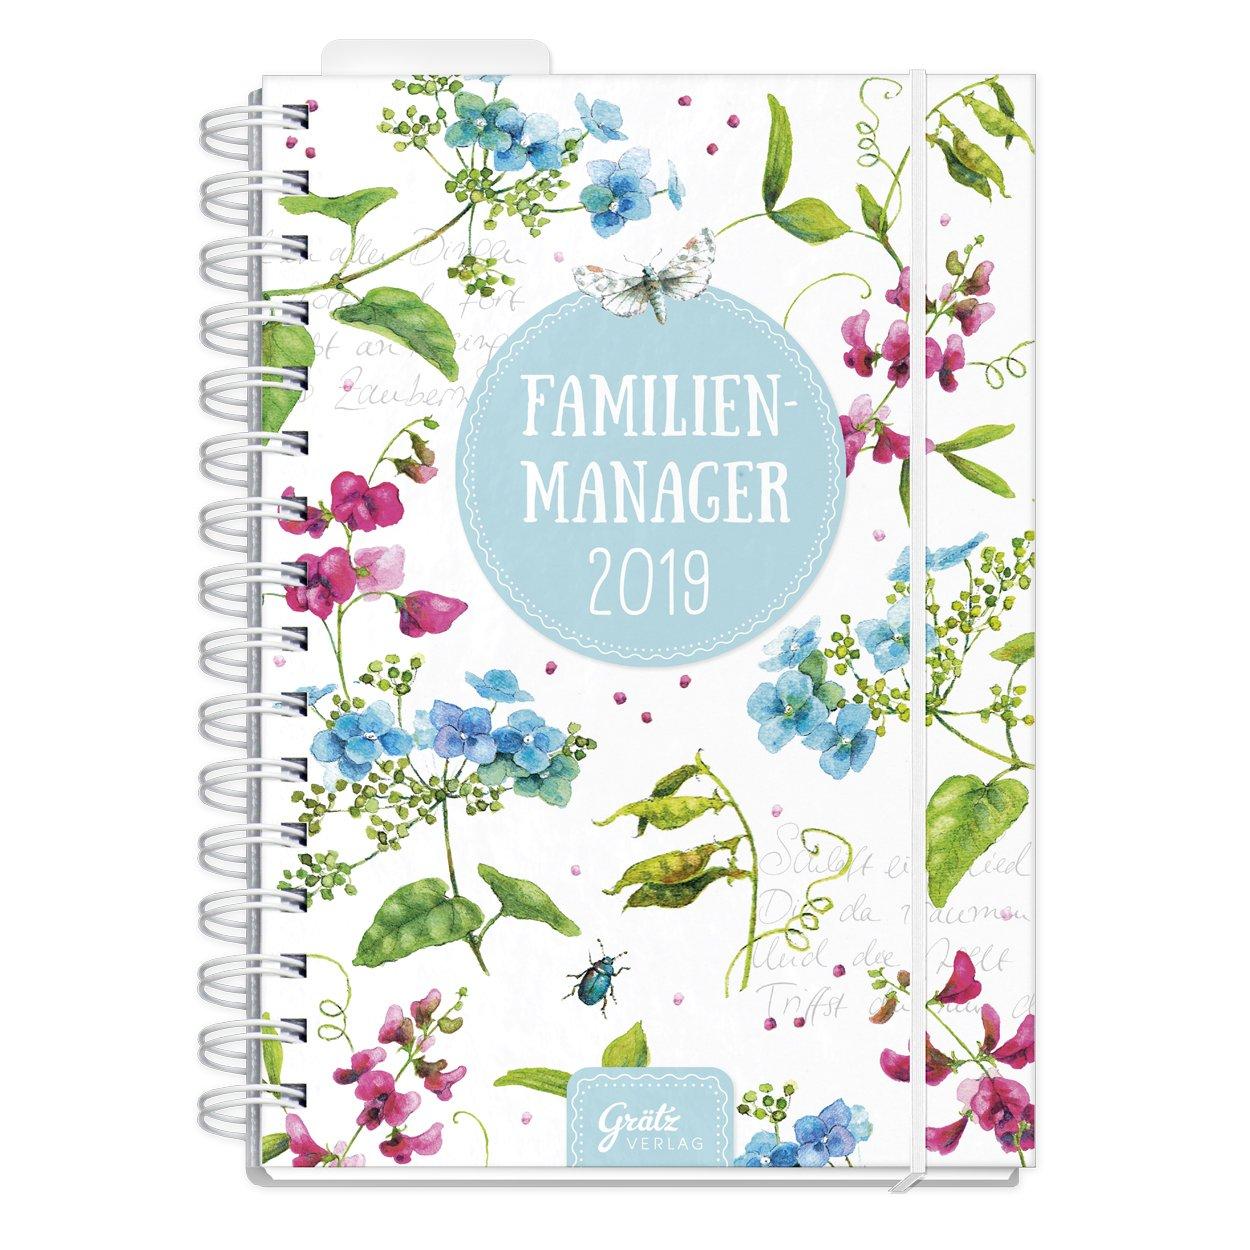 Familienmanager 2019 'Sommerglück', Daniela Drescher, Grätz Verlag Kalender – 1. Juni 2018 Grätz Verlag 3946861369 Kalender / Zeitplansysteme Zeitplansysteme / Kalender